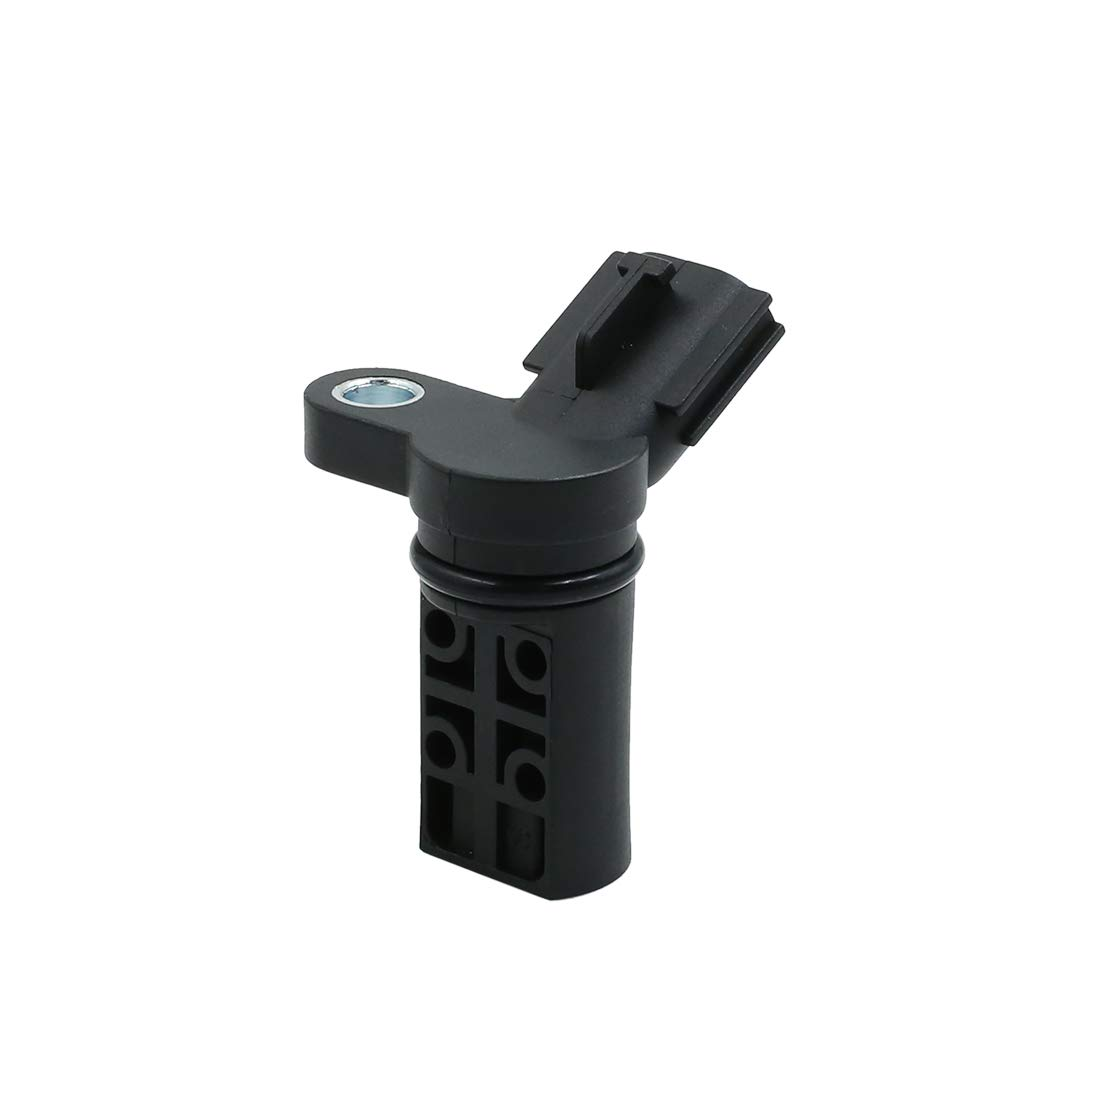 X AUTOHAUX 3 Terminals Car Crankshaft Position Sensor 23731AL61A for Nissan Frontier Altima Maxima Pathfinder Infiniti FX35 G35 I35